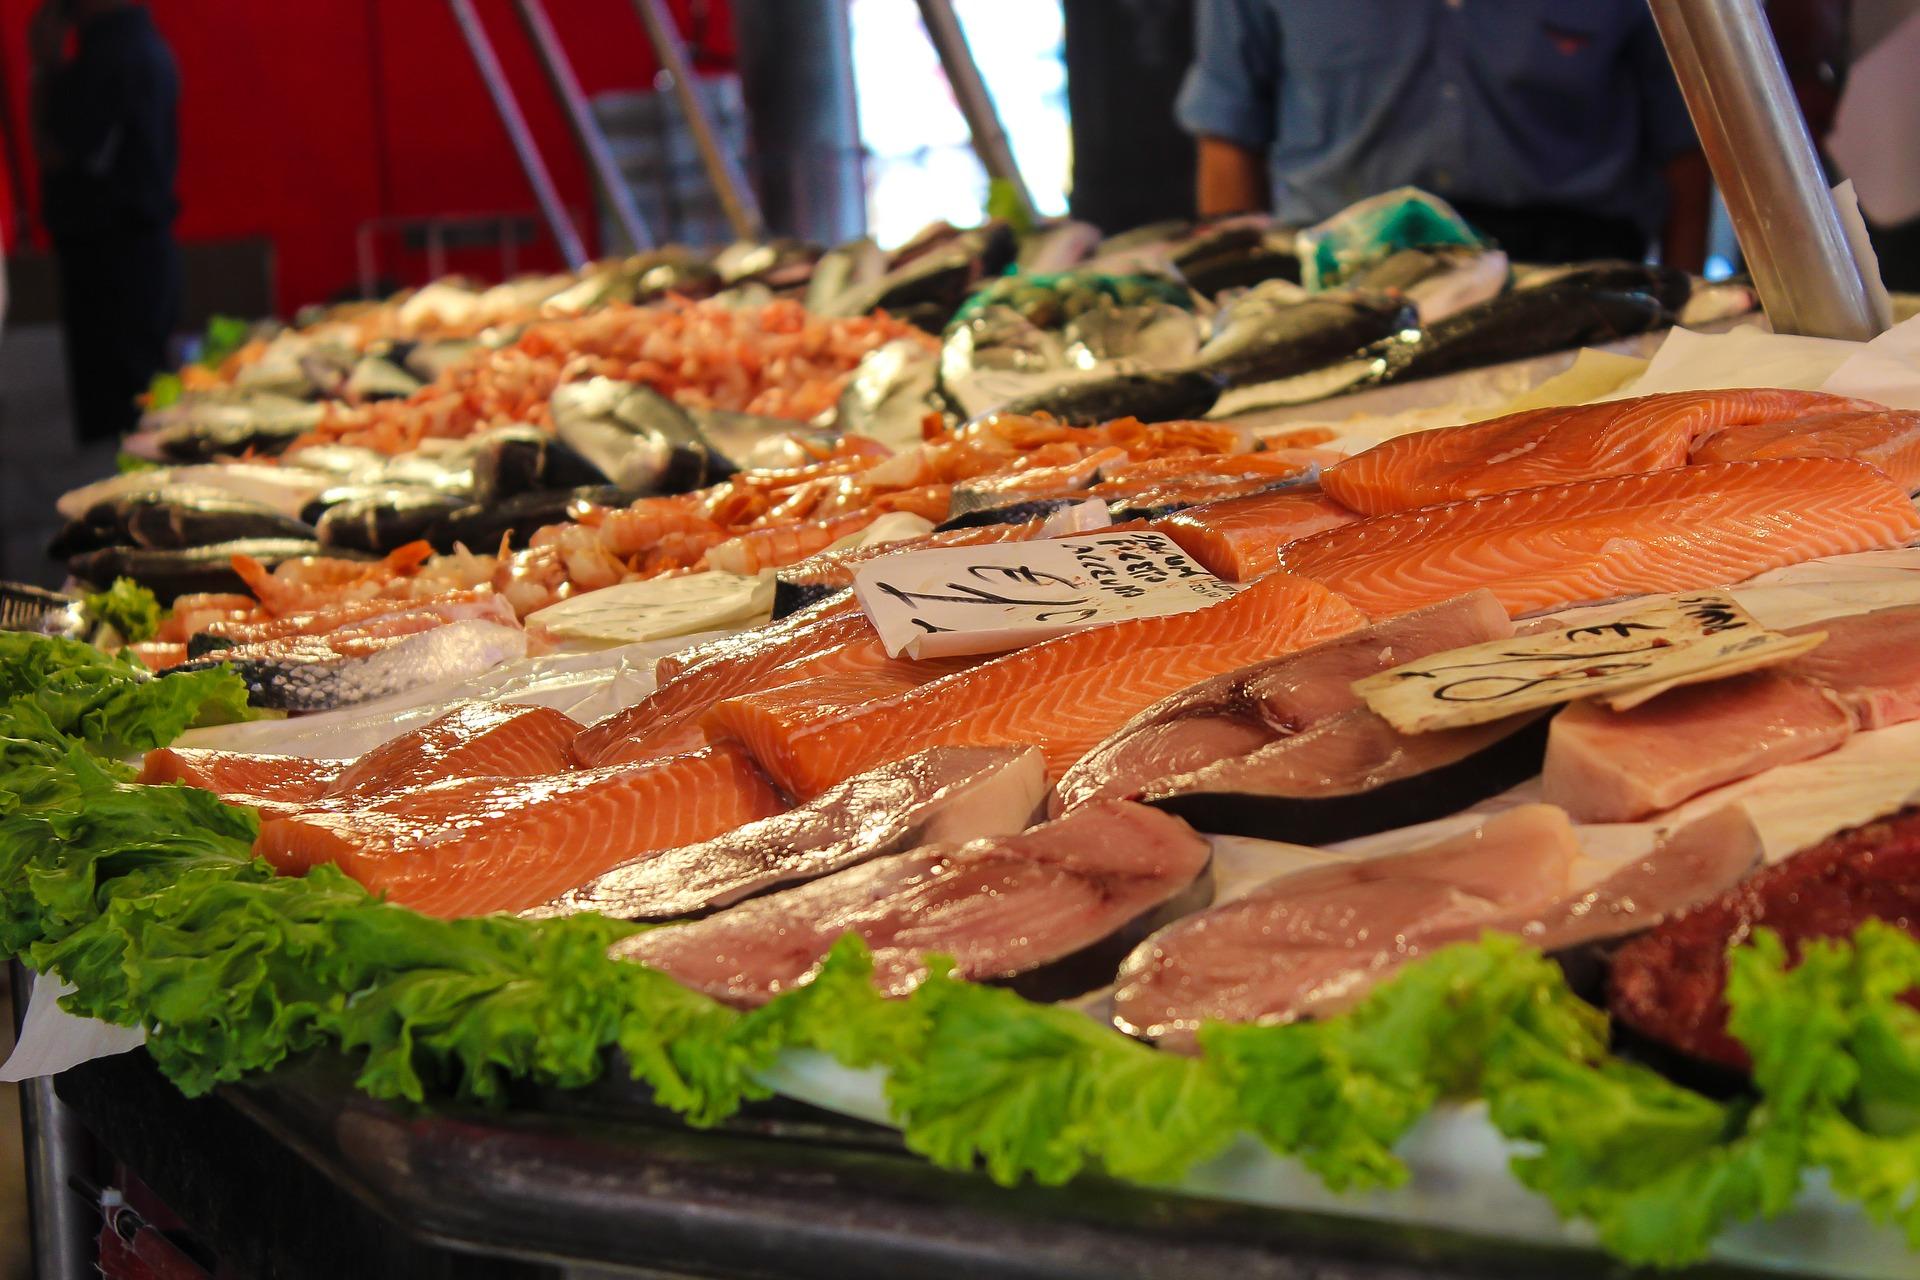 Fischmarkt in Rialto